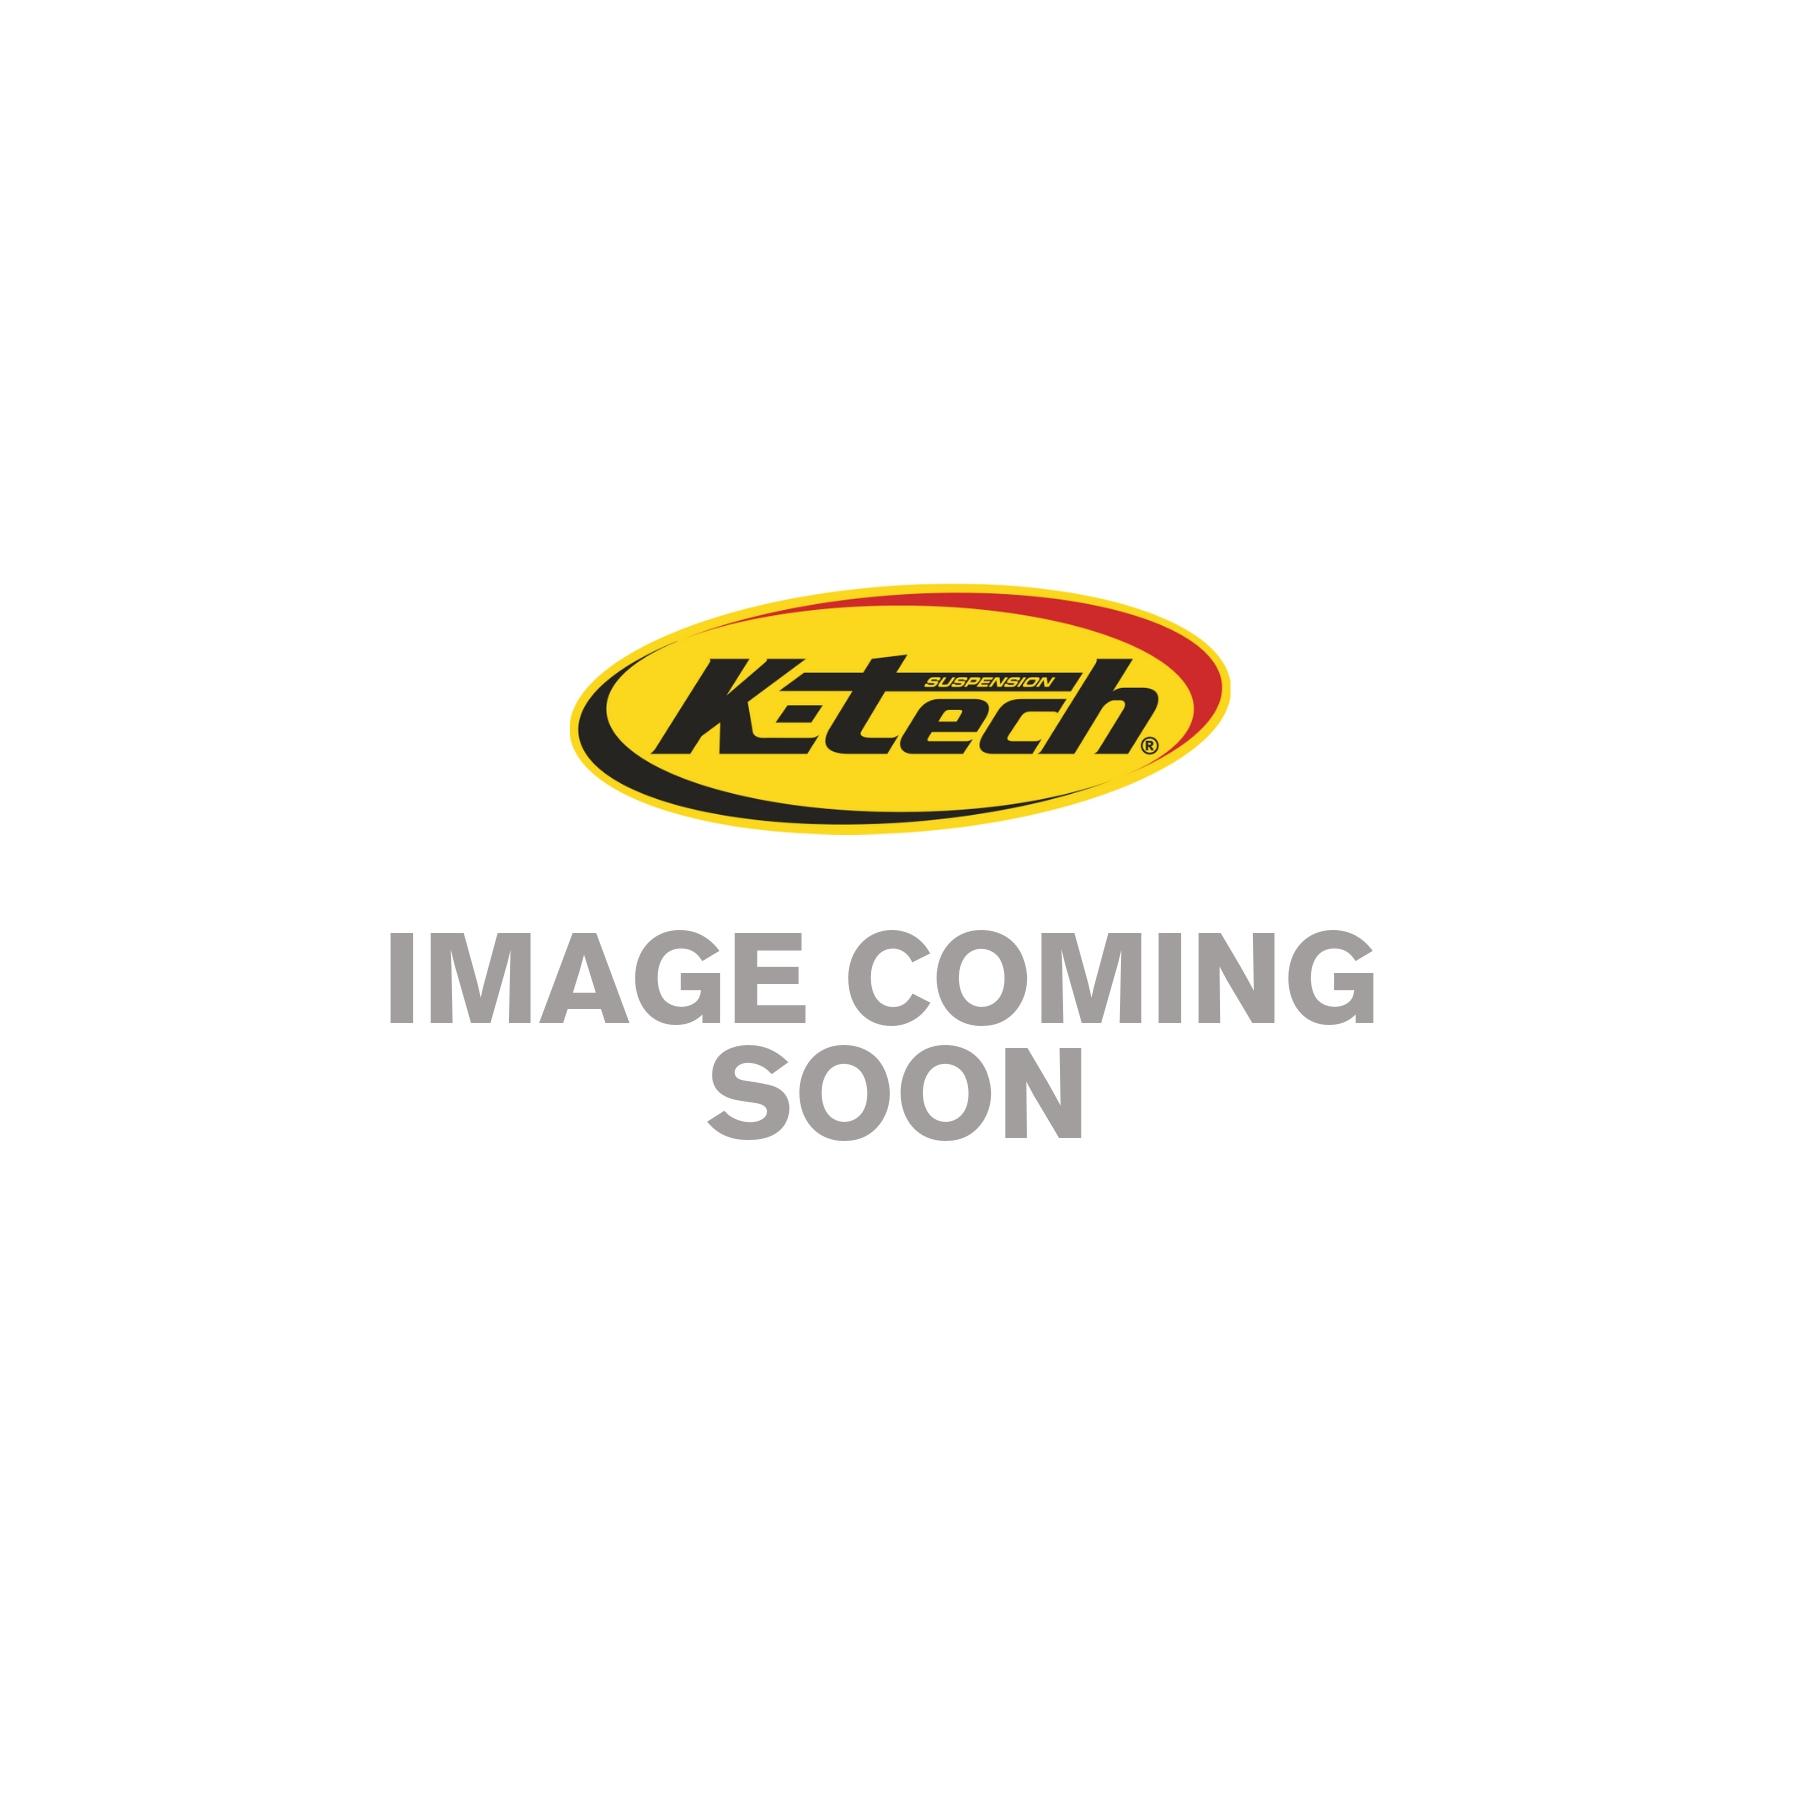 25IDS Front Fork Cartridges Kawasaki Z1000SX ABS 2014> Showa BPF